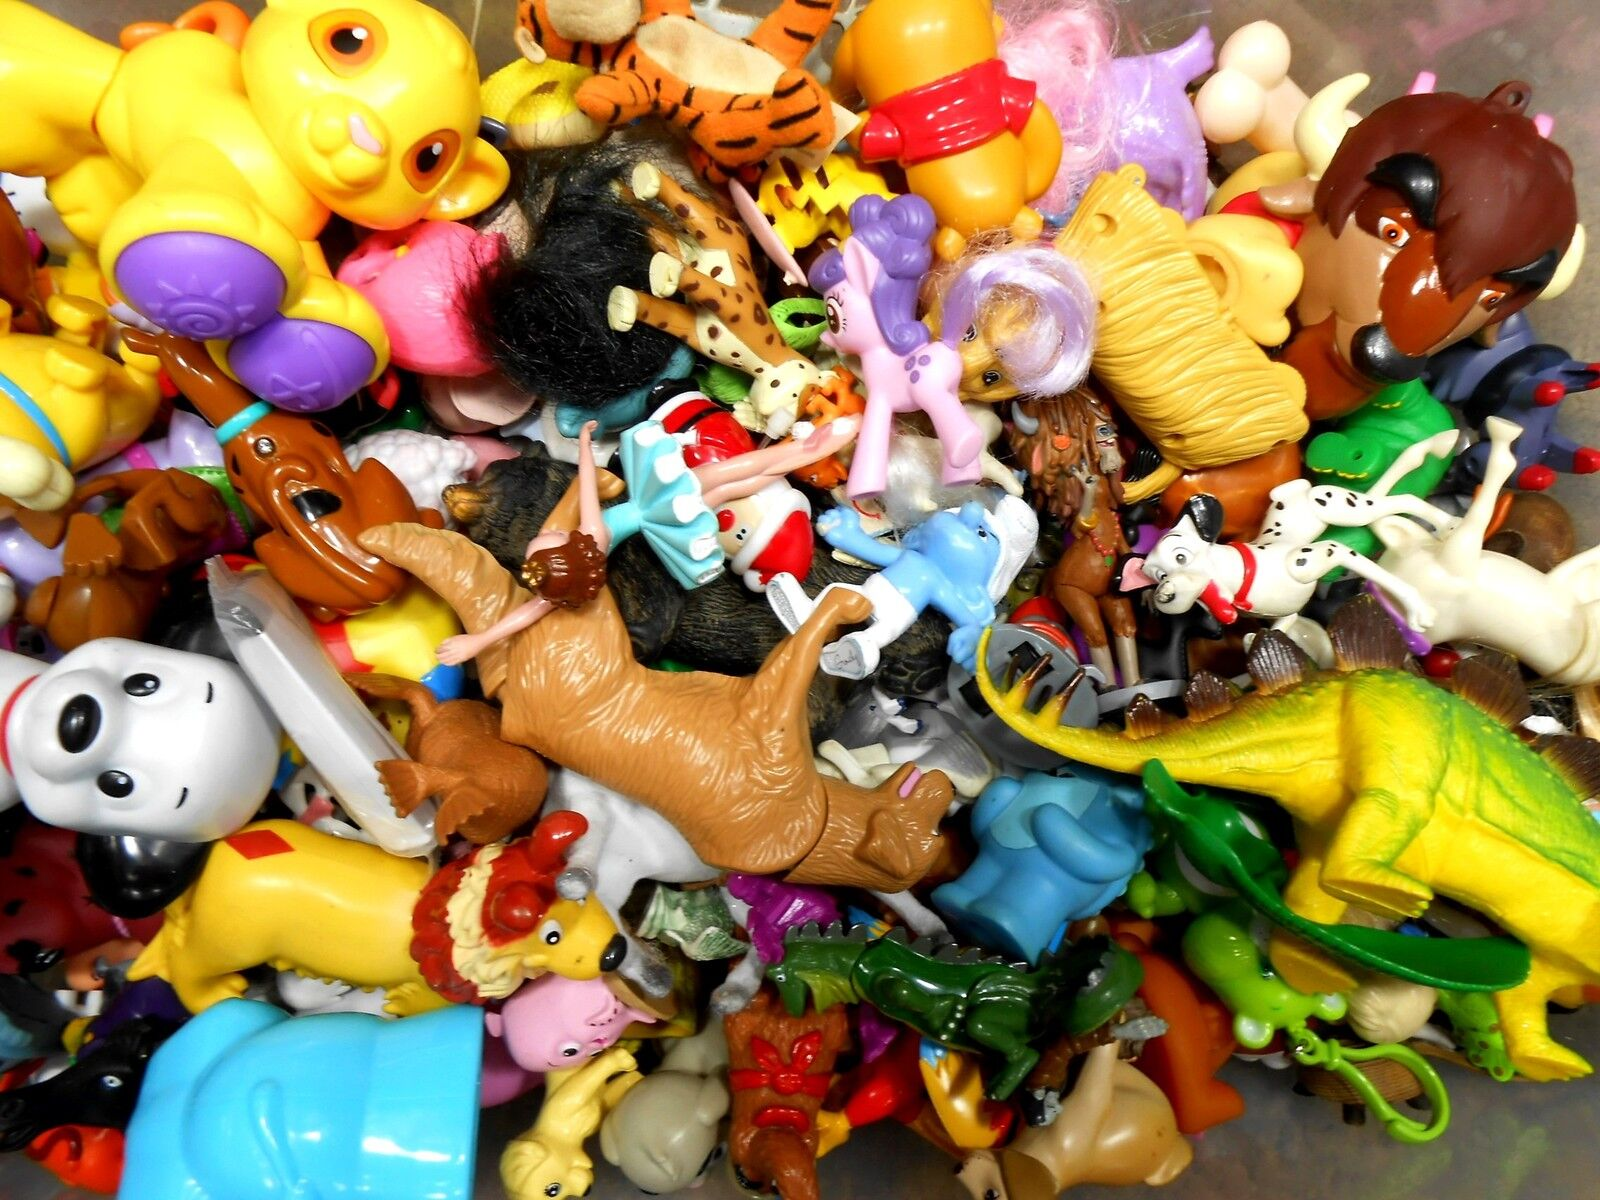 Brad & Kathy's - Ties Scarfs Toys